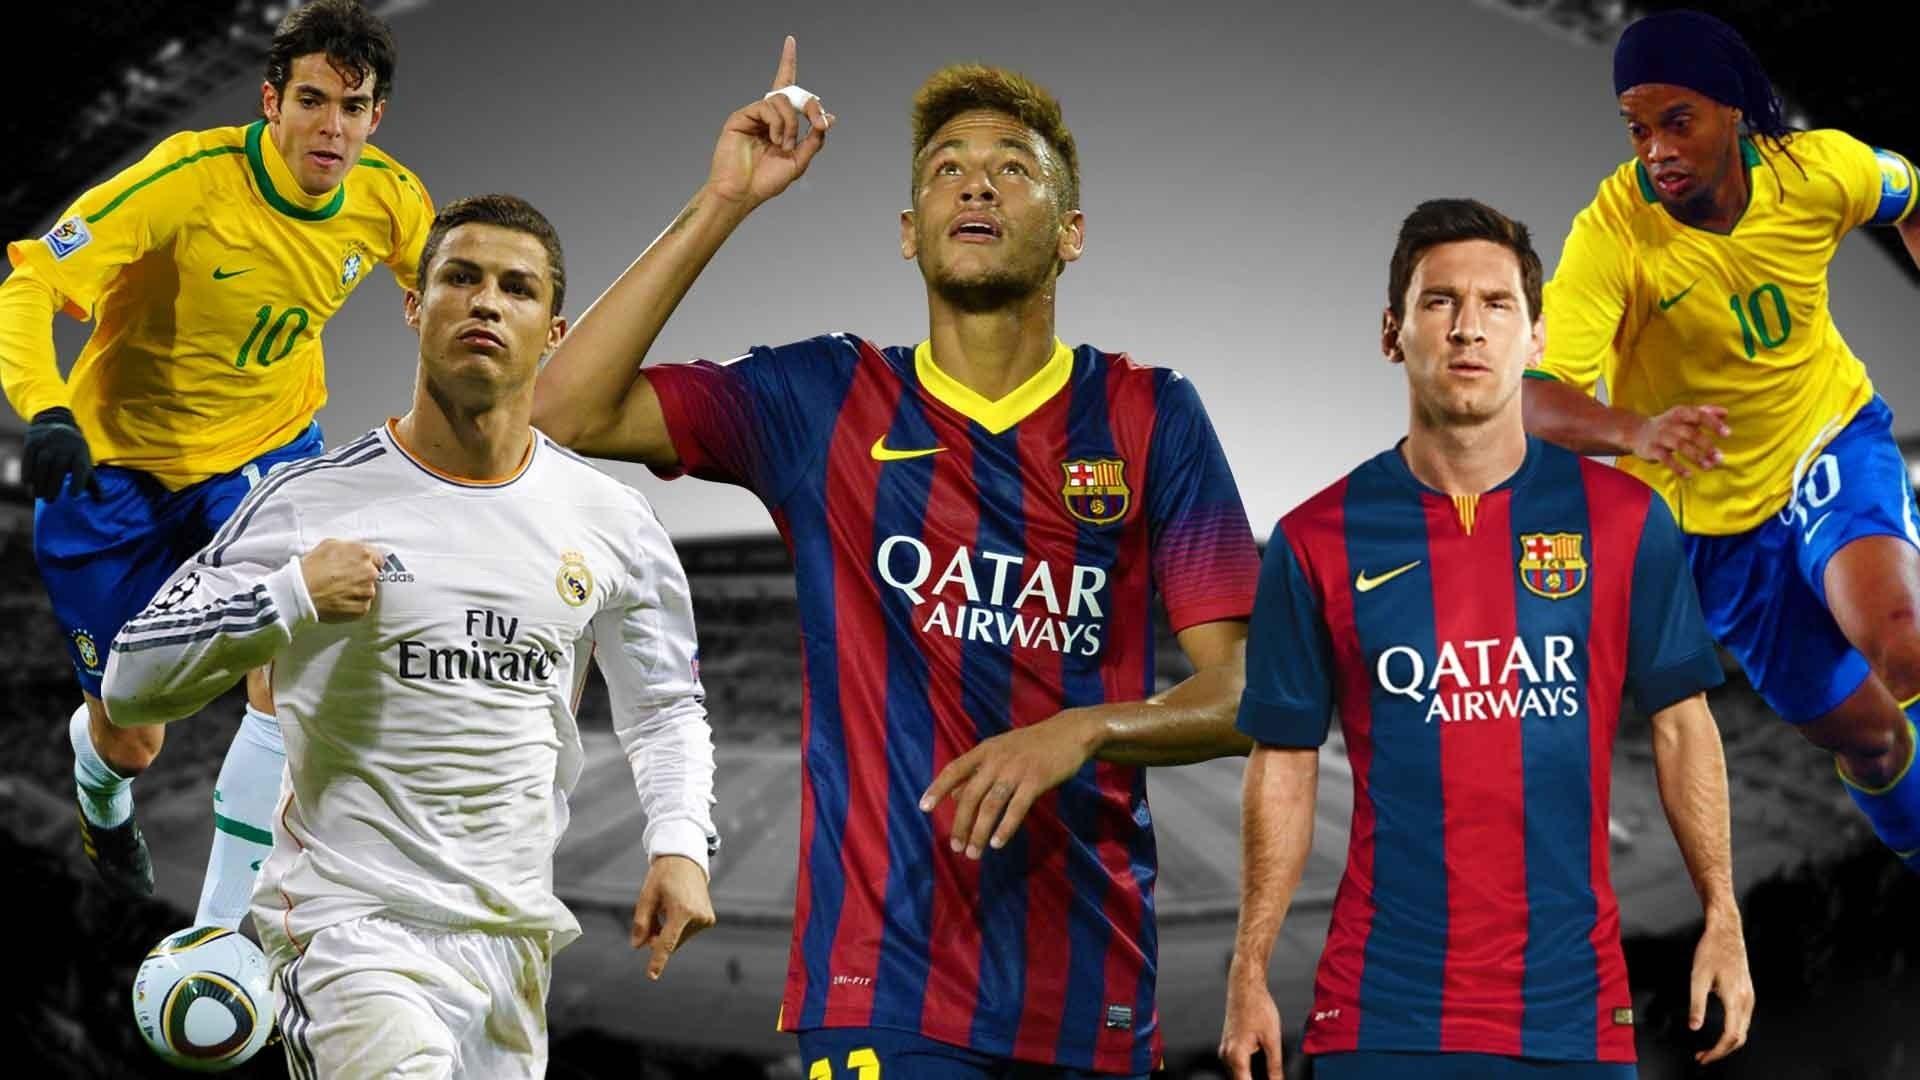 Neymar Vs Ronaldinho 2012 Messi vs Ronaldo Wallp...